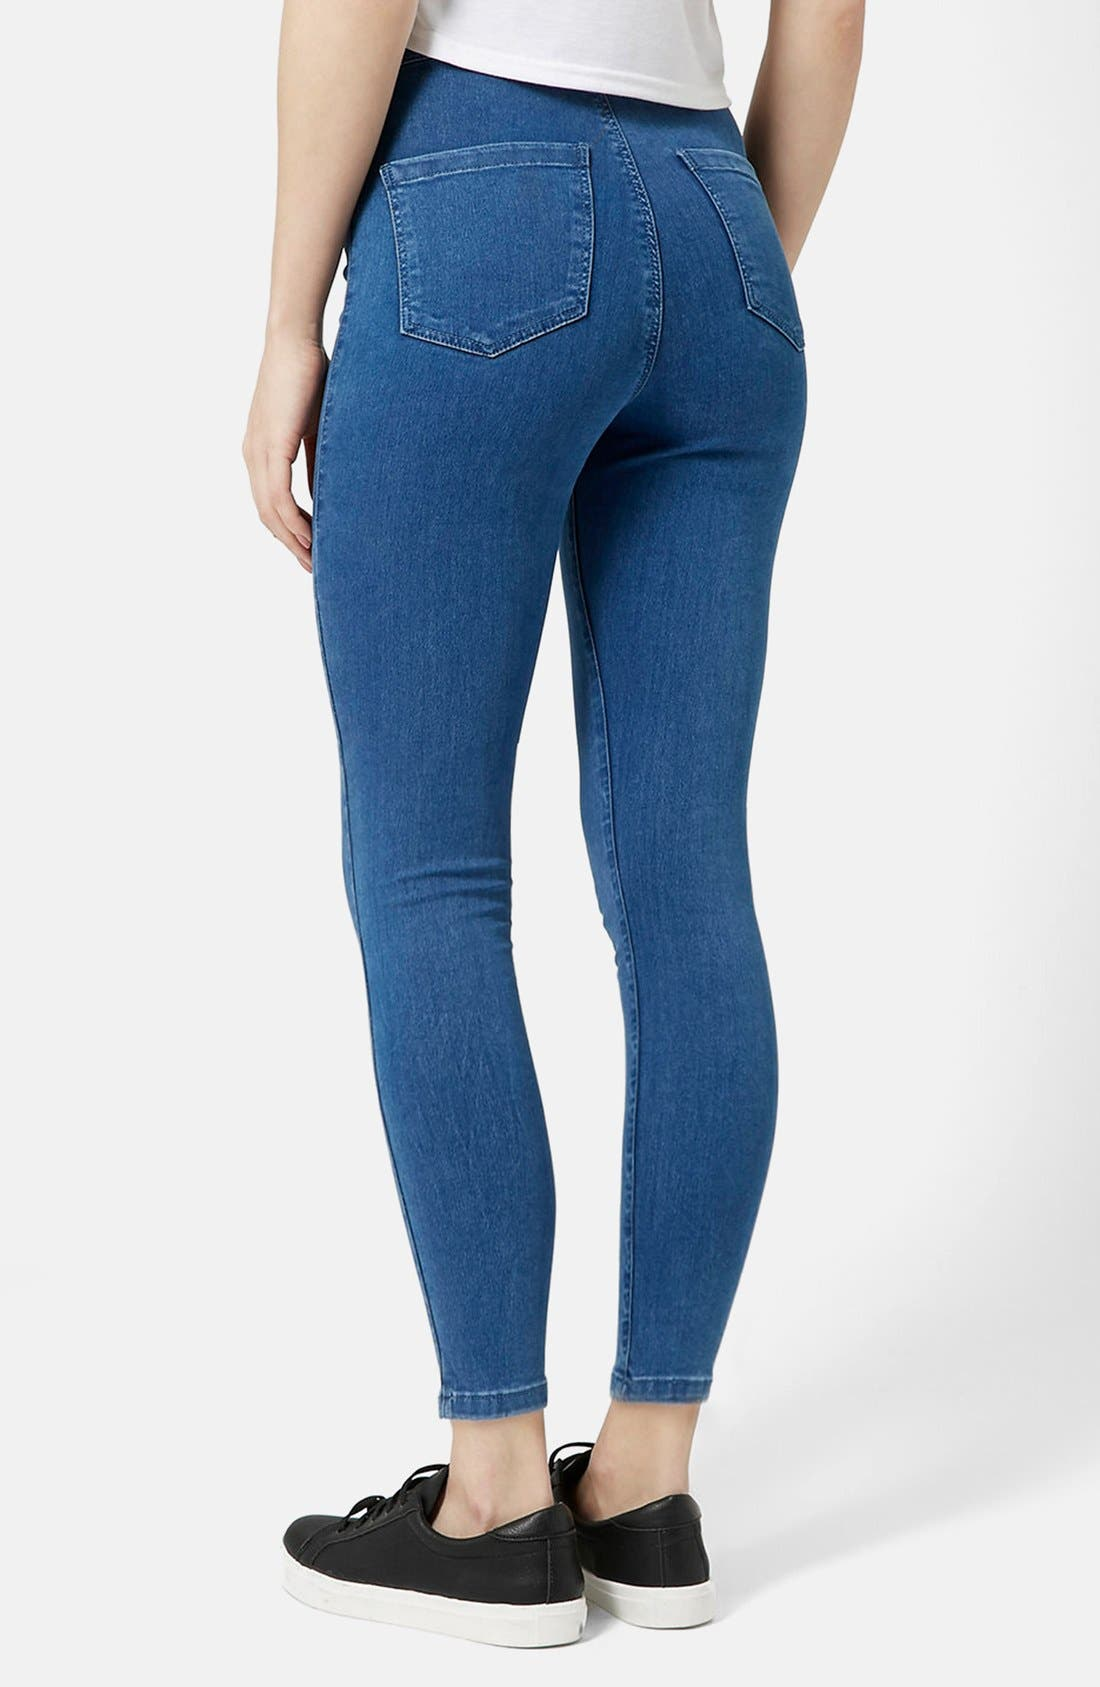 Alternate Image 2  - Topshop Moto 'Joni' High Rise Super Skinny Jeans (Mid Denim) (Petite)